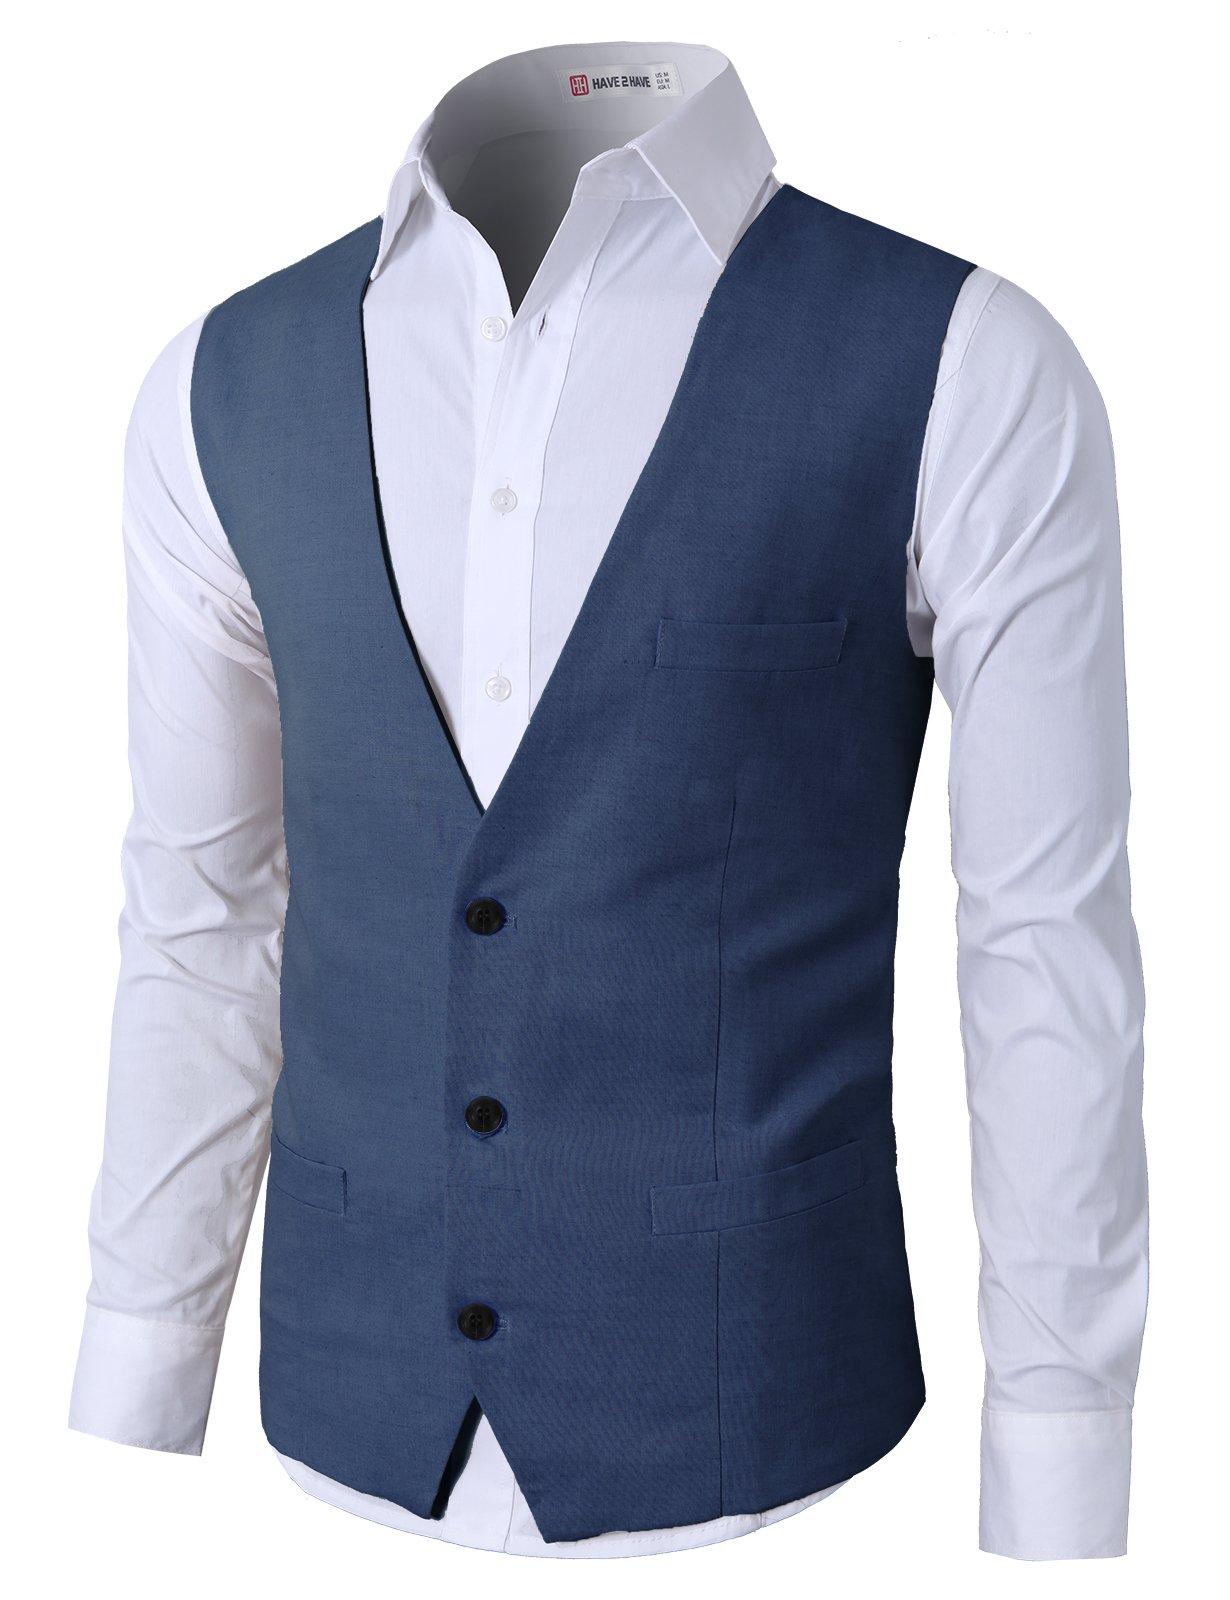 H2H Business Dandy Casual Slim Fit Stylish Suit Solid 3 Button Linen Vest Navy US L/Asia XL (CMOV039) by H2H